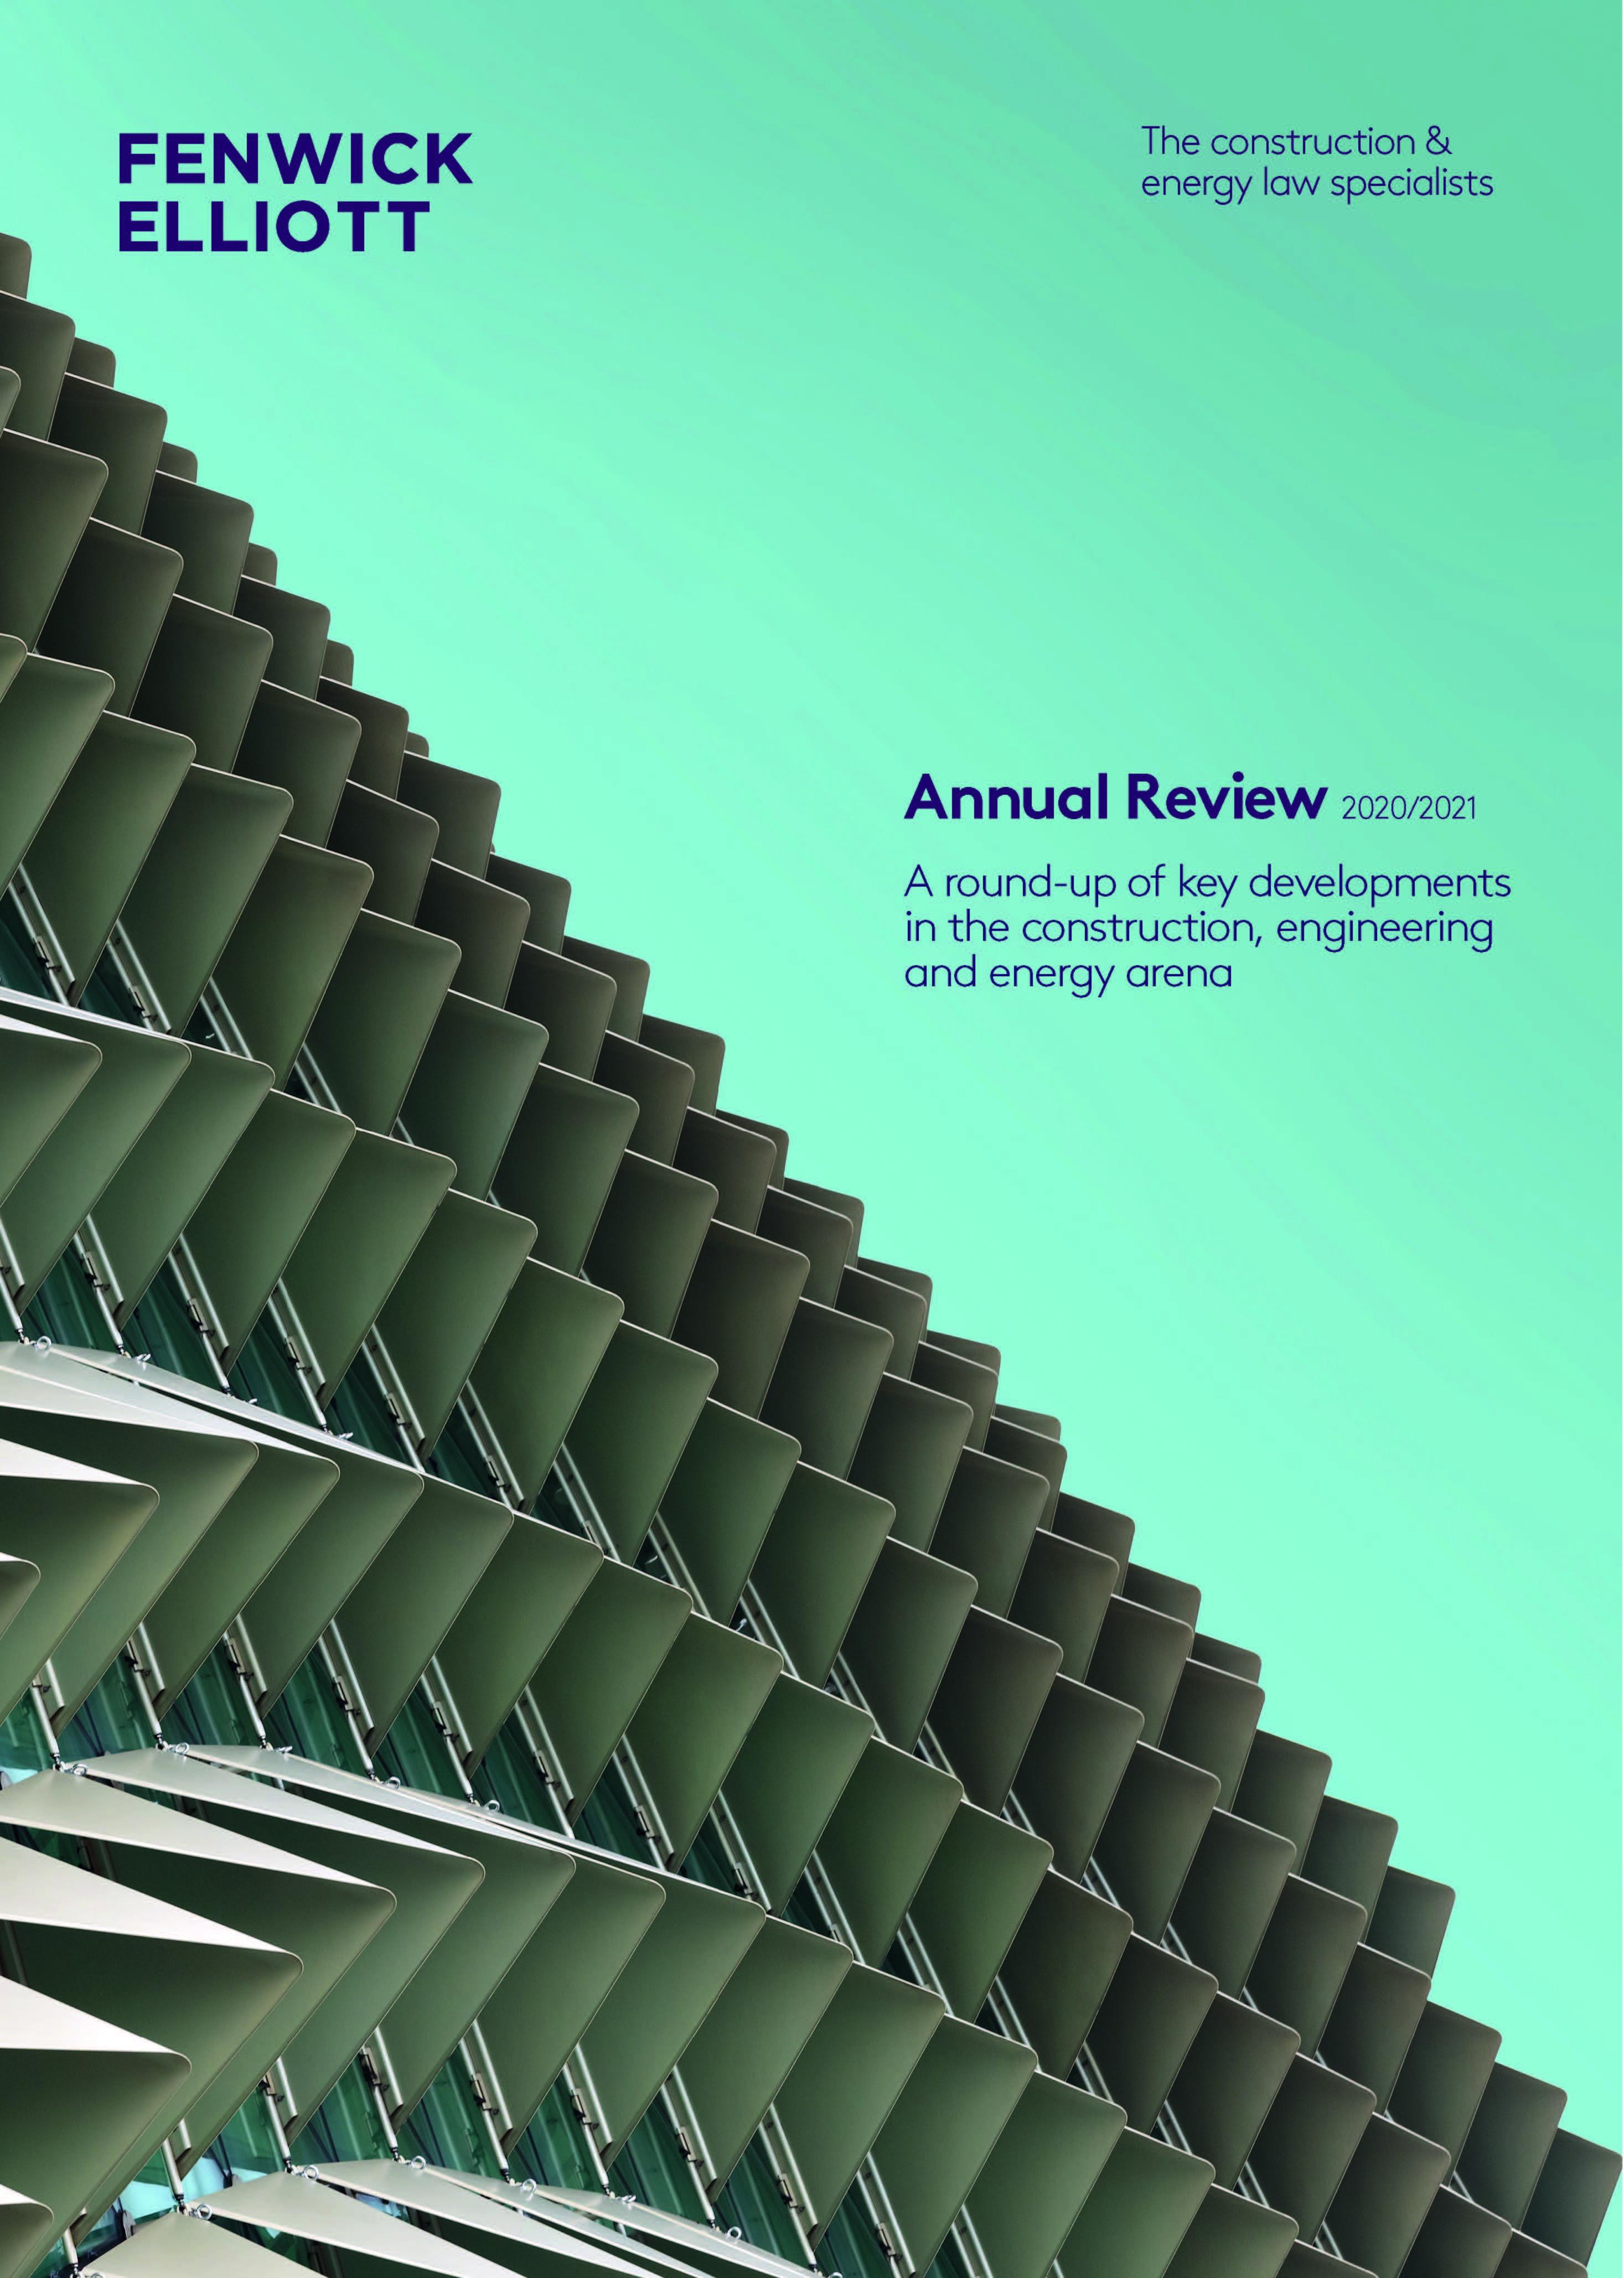 Fenwick Elliott Annual Review 2020/2021